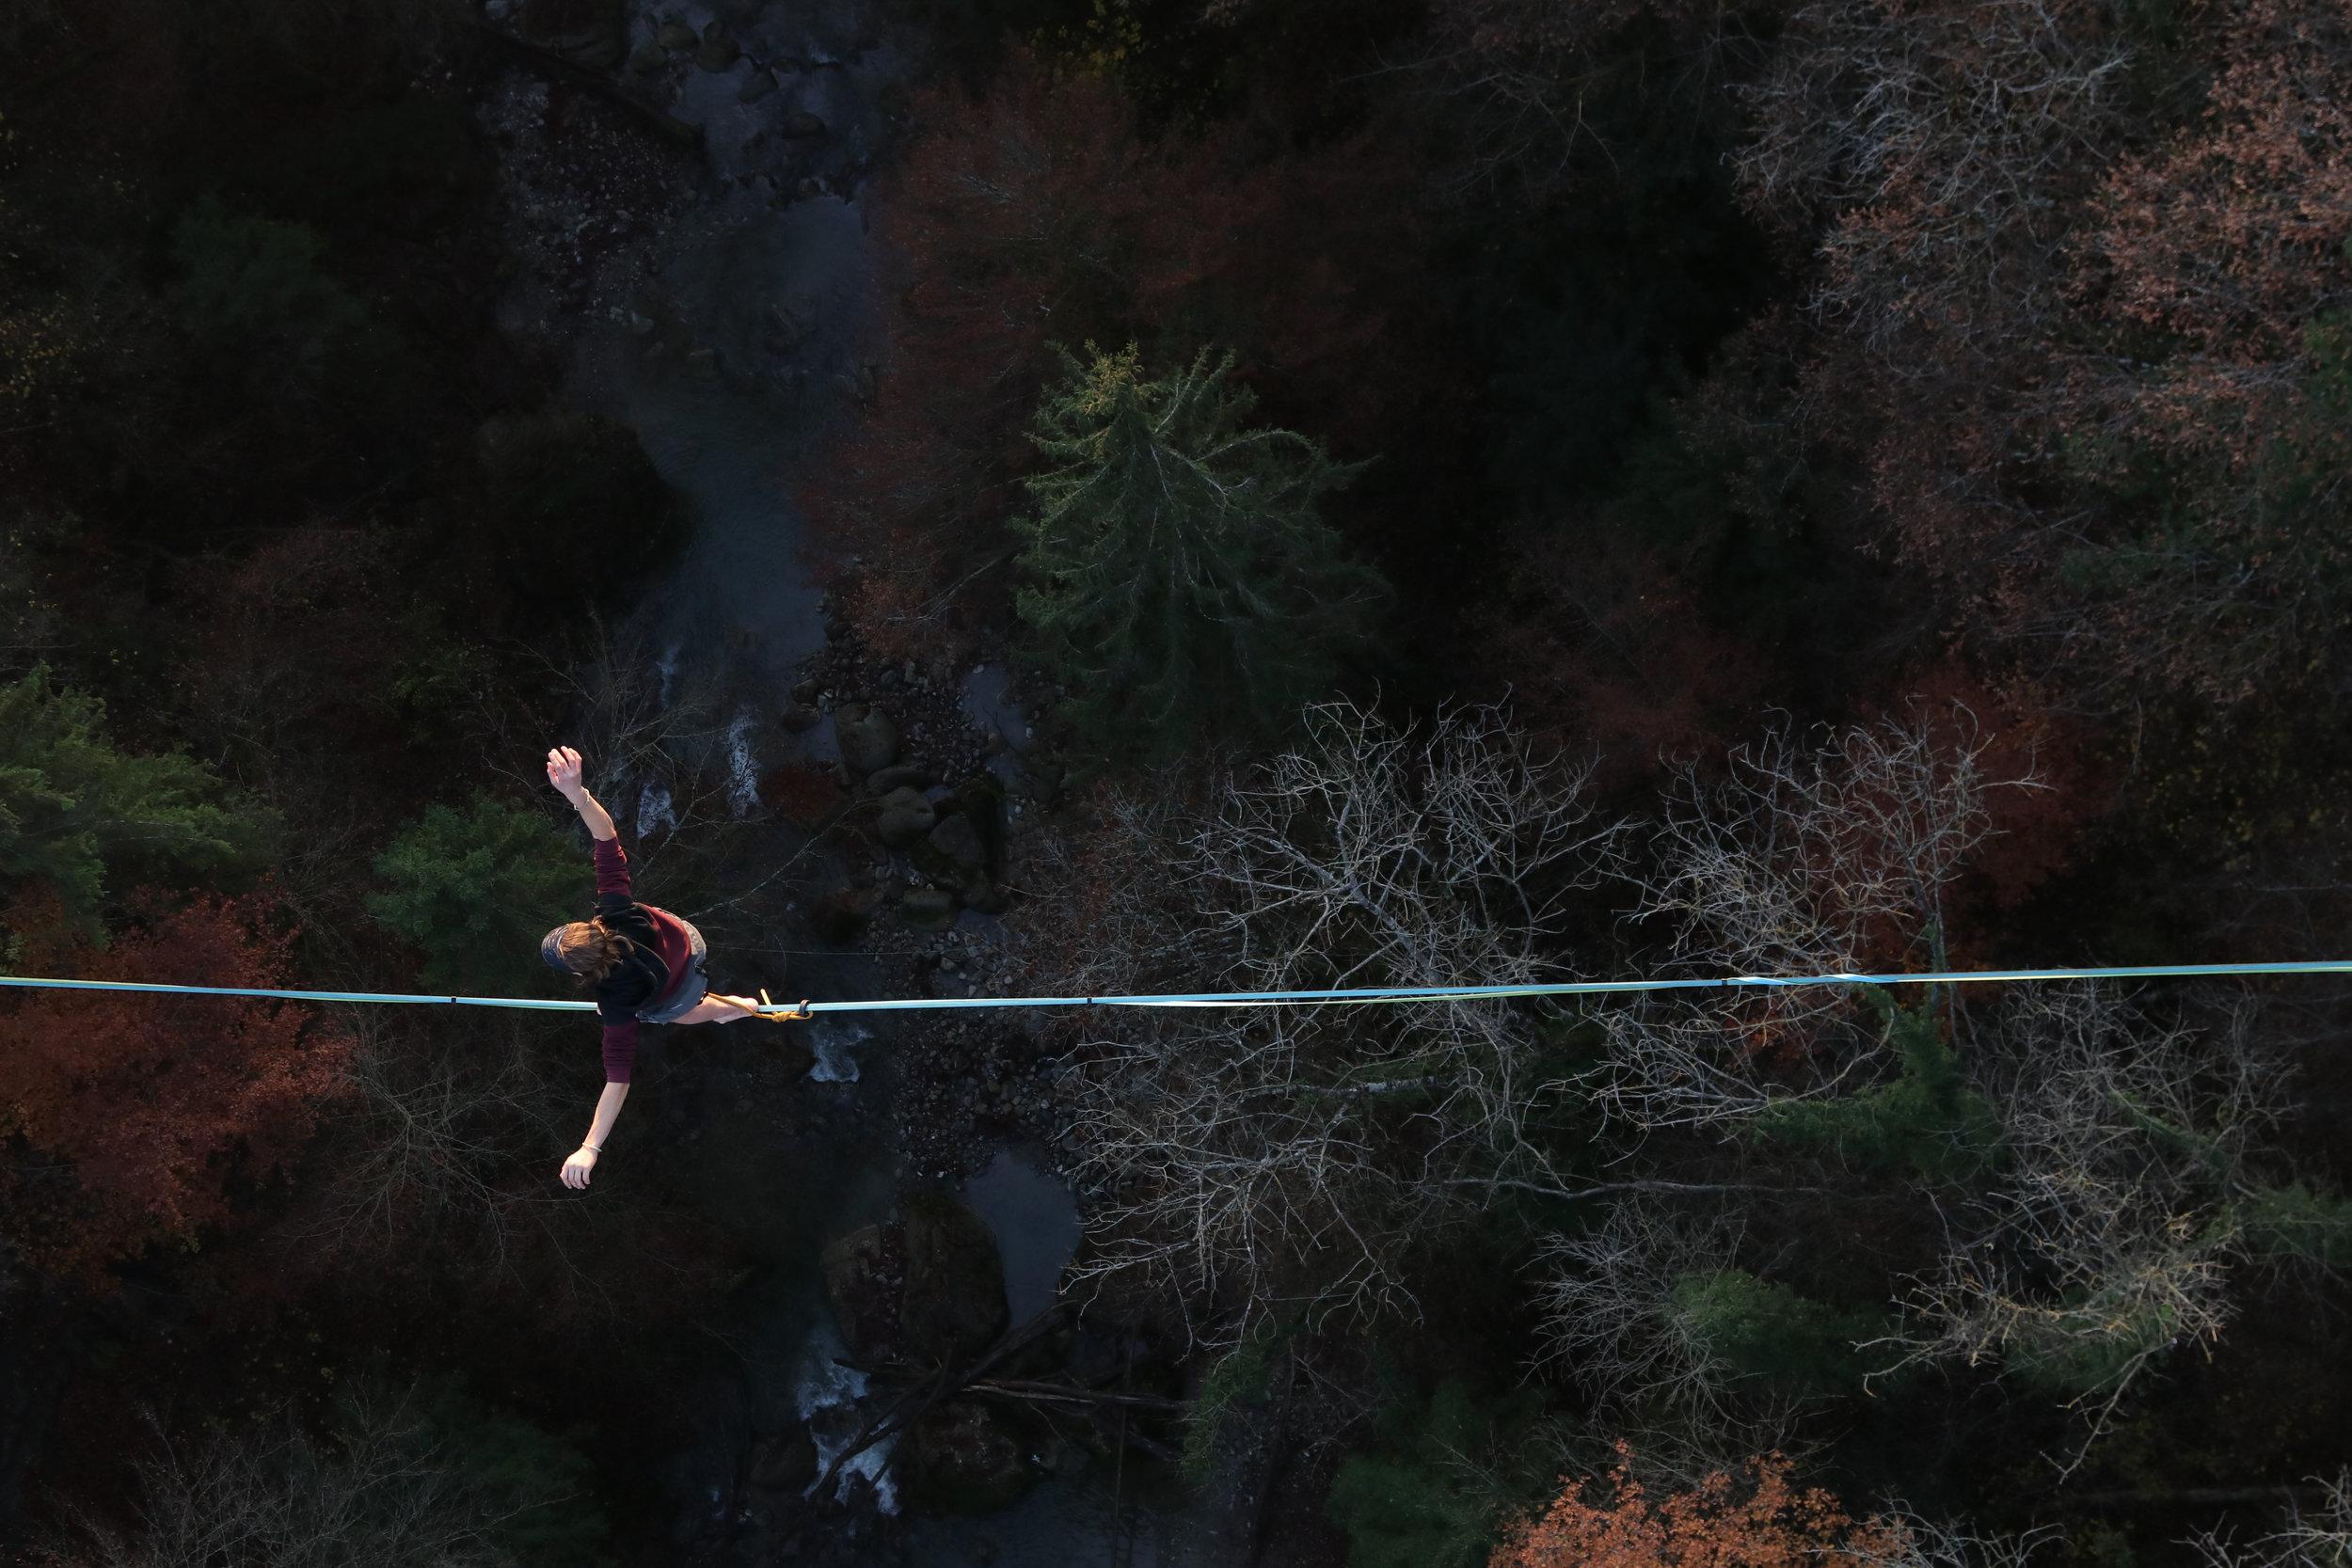 Pont de Fenil, Vevey, Suisse, circus workshop atelier taller ecole school suisse schweiz switzerland Slackline Lyell Grunberg show performance spectacle Highline trickline (7).JPG